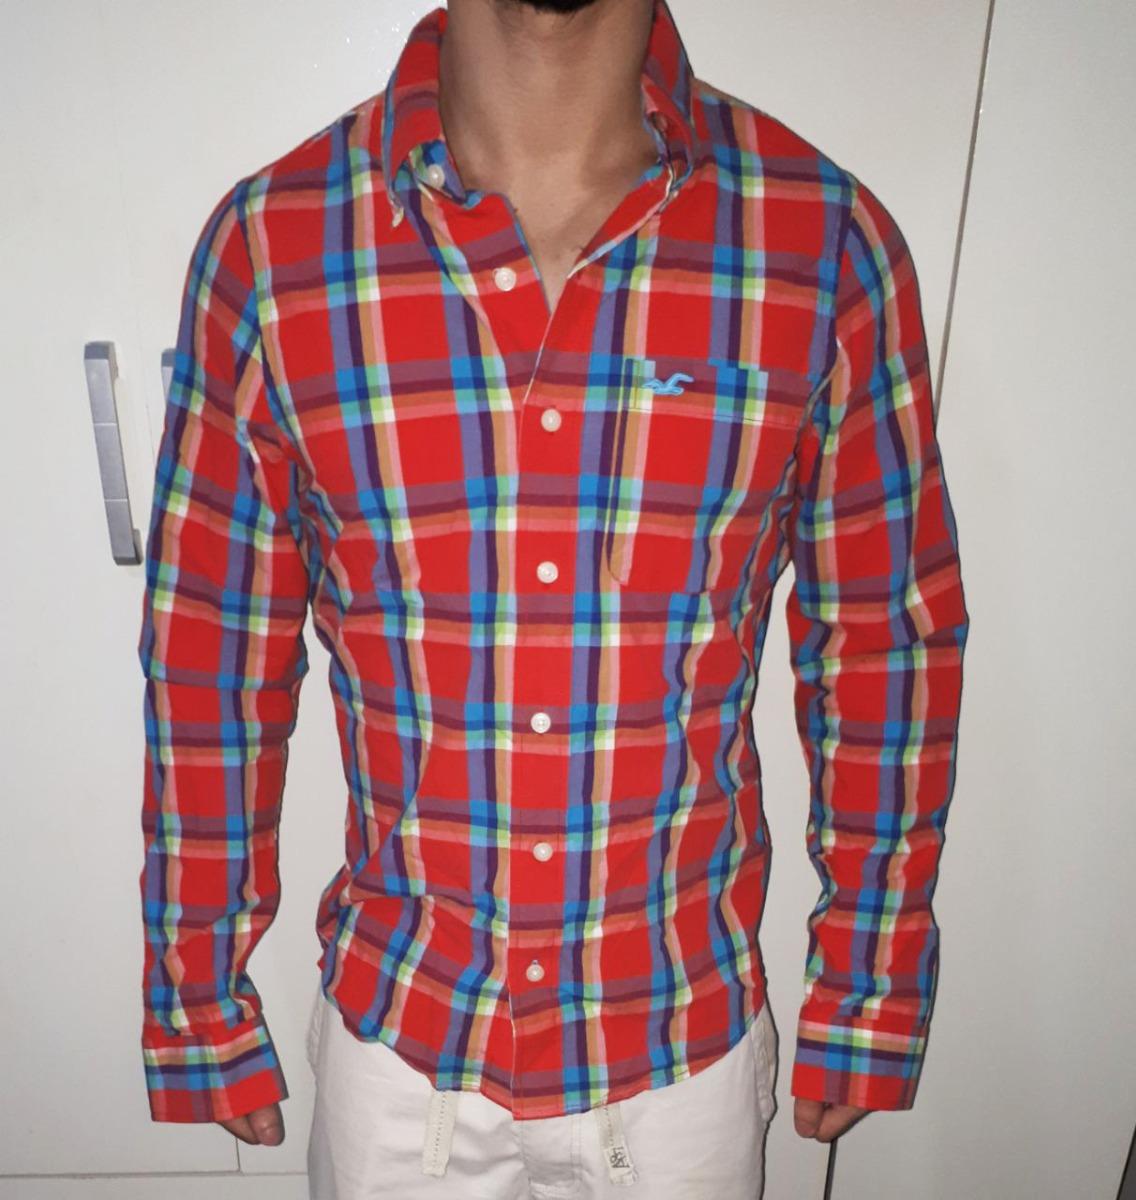 d725fa2363 camisa xadrez hollister masculina tamanho m manga longa. Carregando zoom.